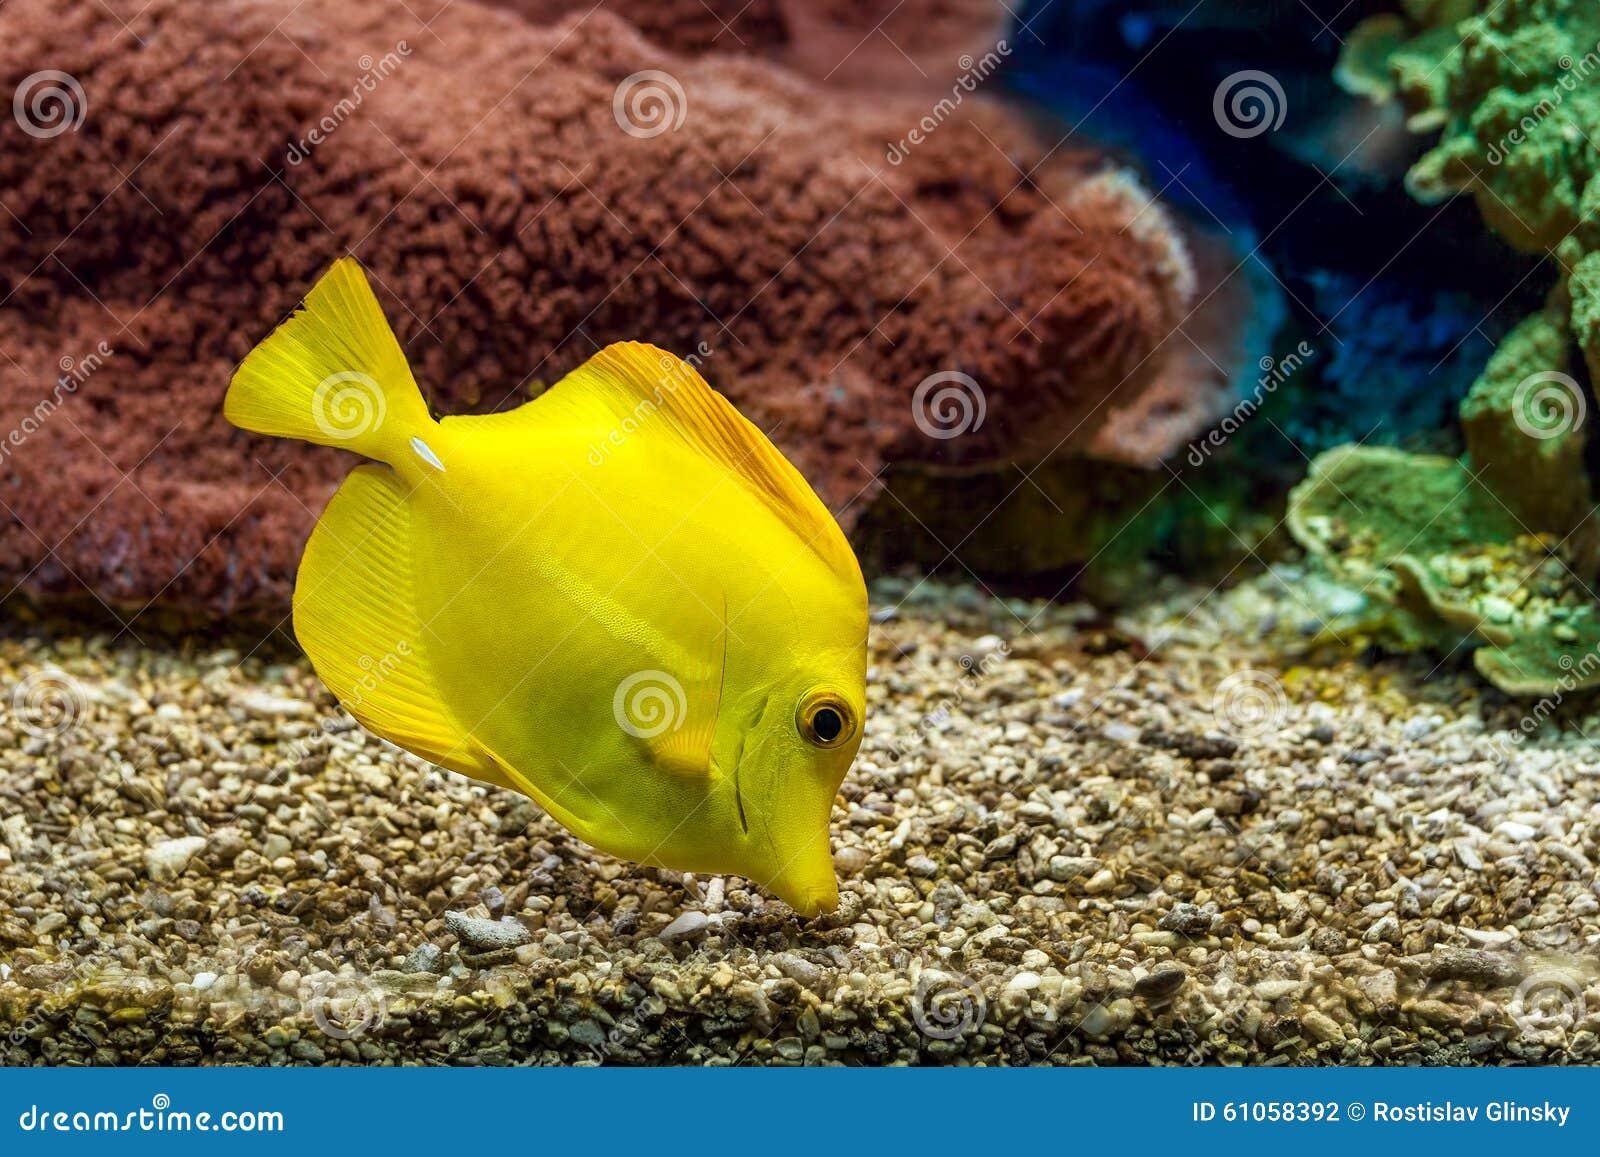 Yellow tang in aquarium stock photo image 61058392 for Saltwater fish food